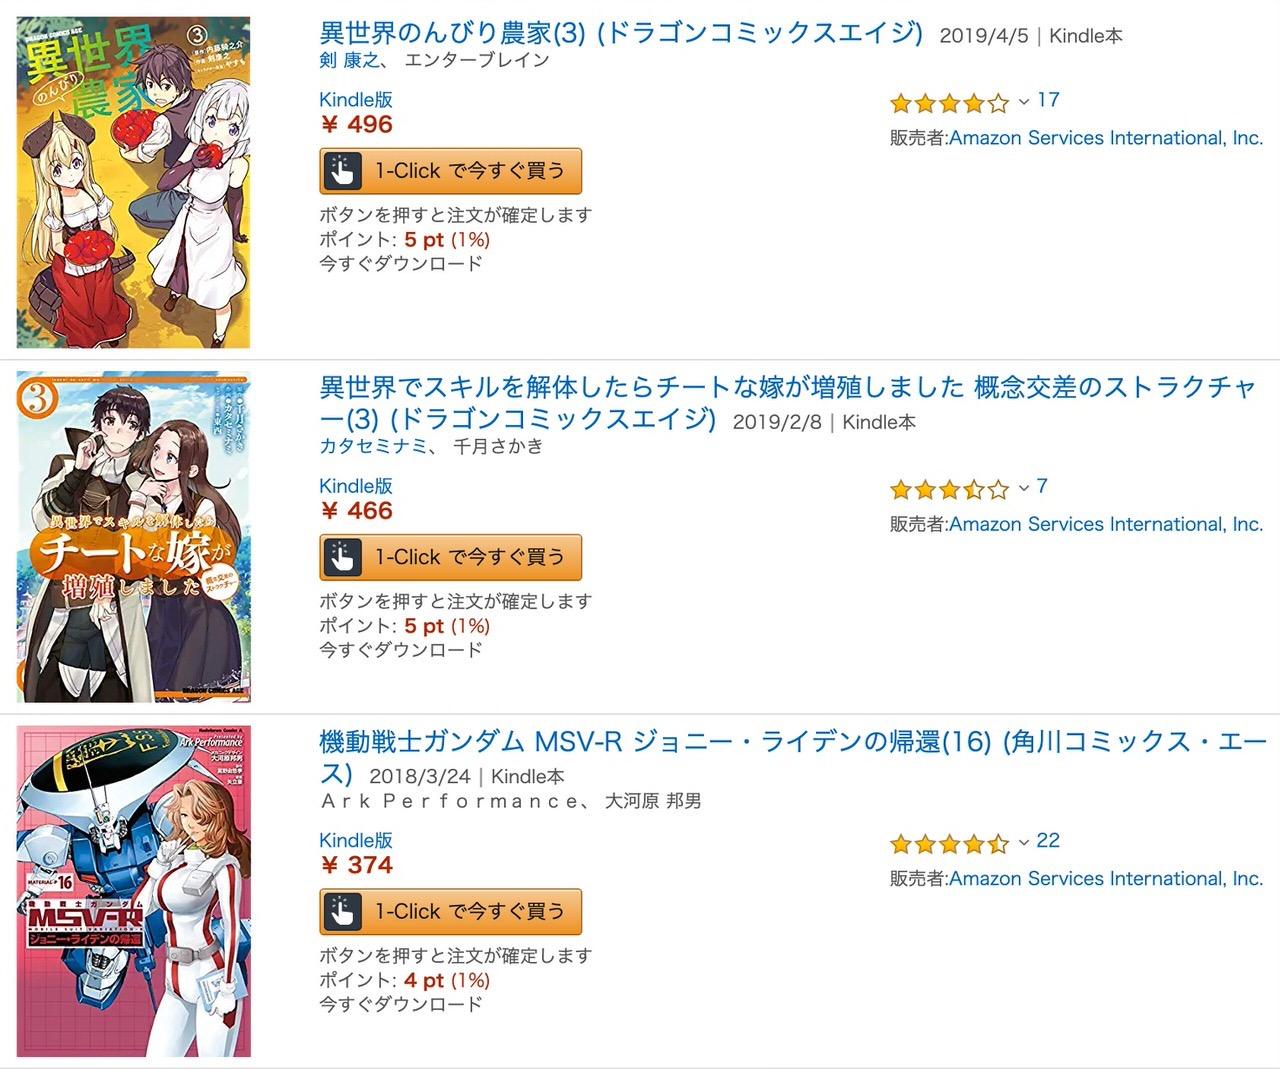 【Kindleセール】60%オフもある!「KADOKAWA夏のコミック&ライトノベル祭り」(8/22まで)